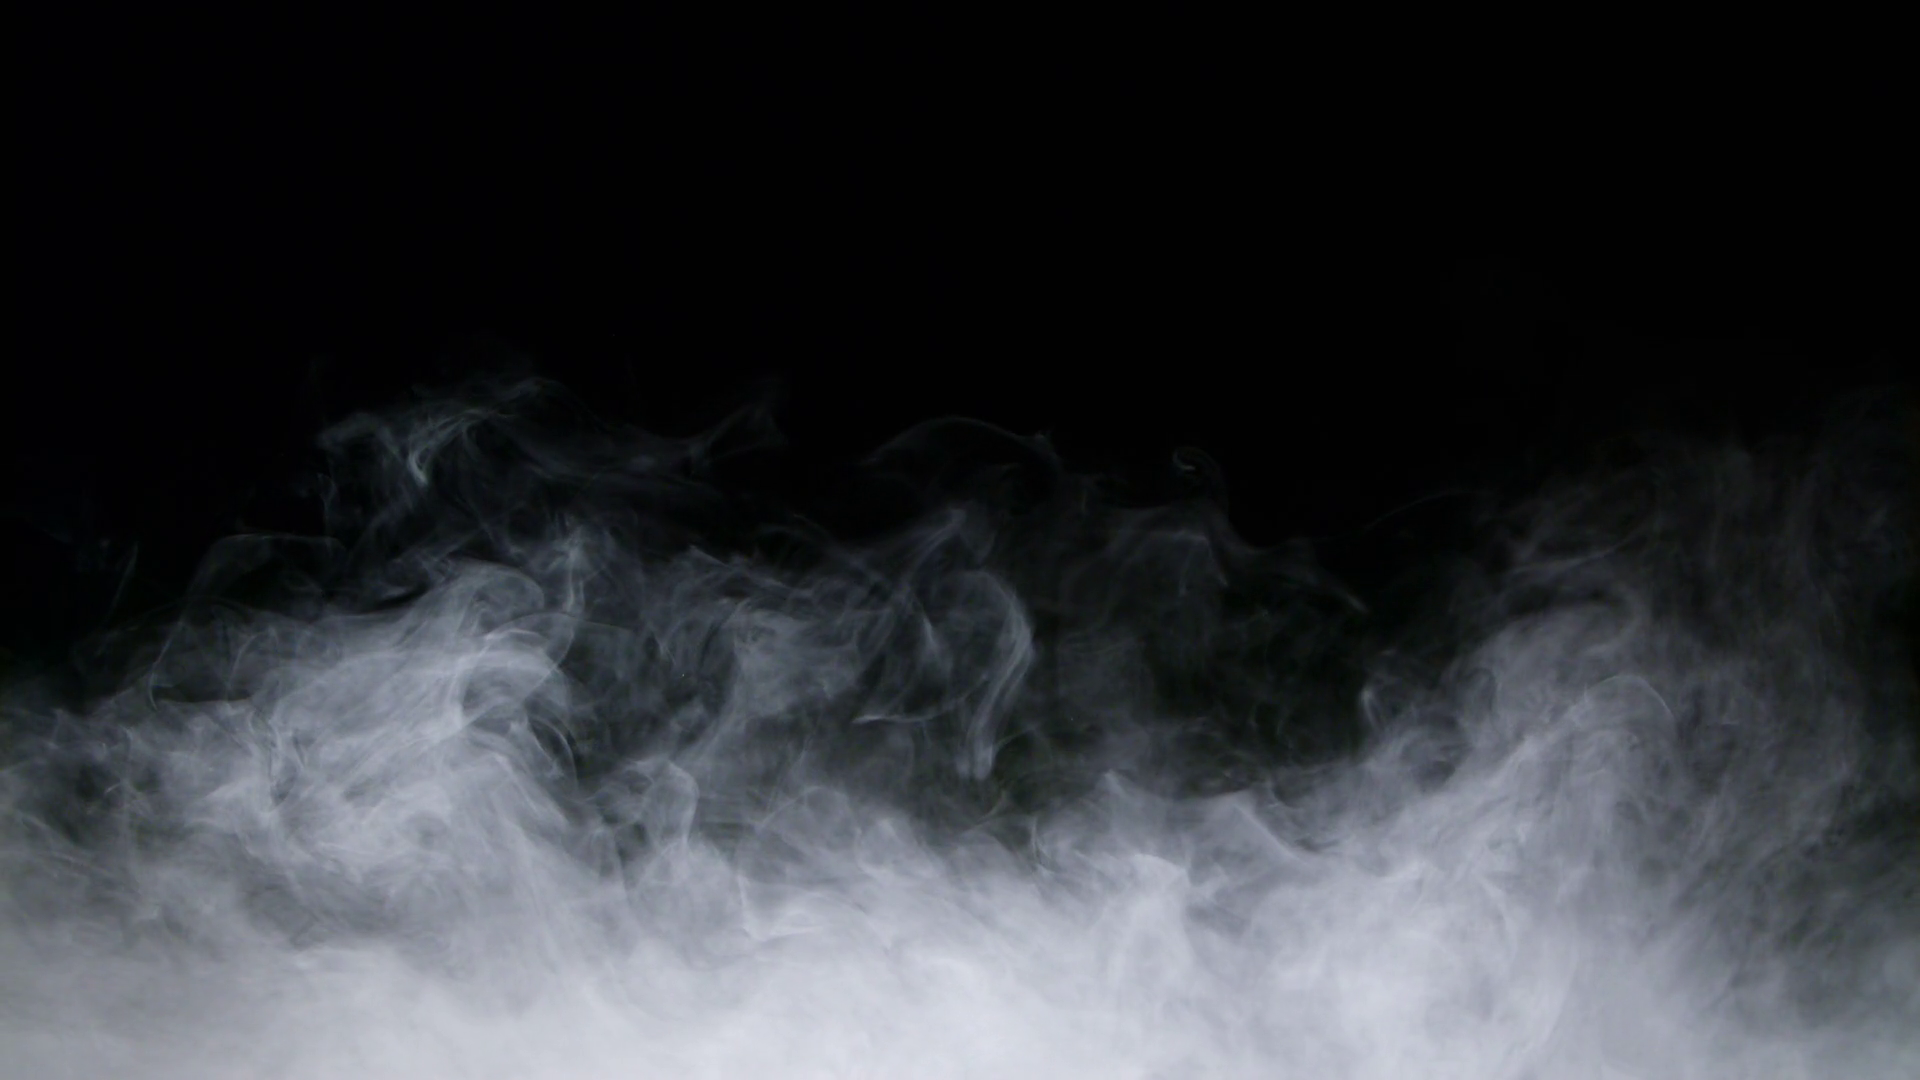 Pin By Gabdrafikov Ajrat On Album Cover 2019 Smoke Background Light Background Images Dark Background Wallpaper